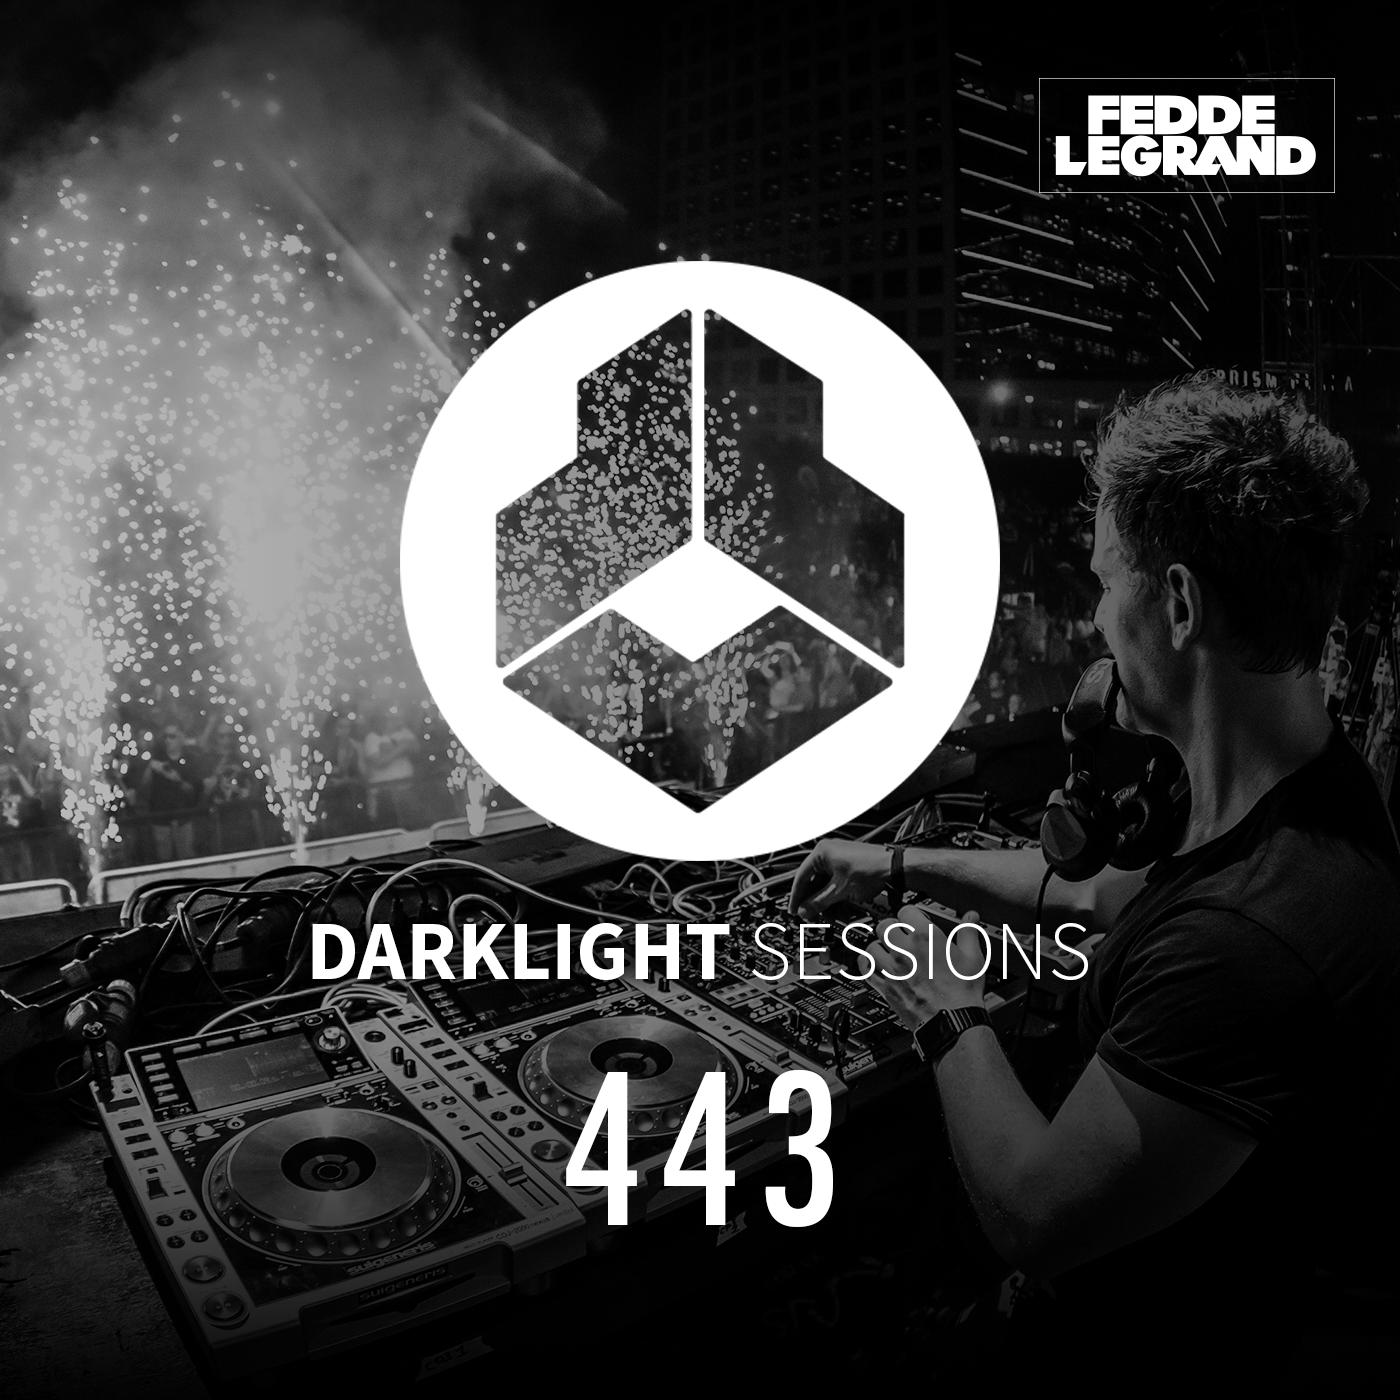 Darklight Sessions 443